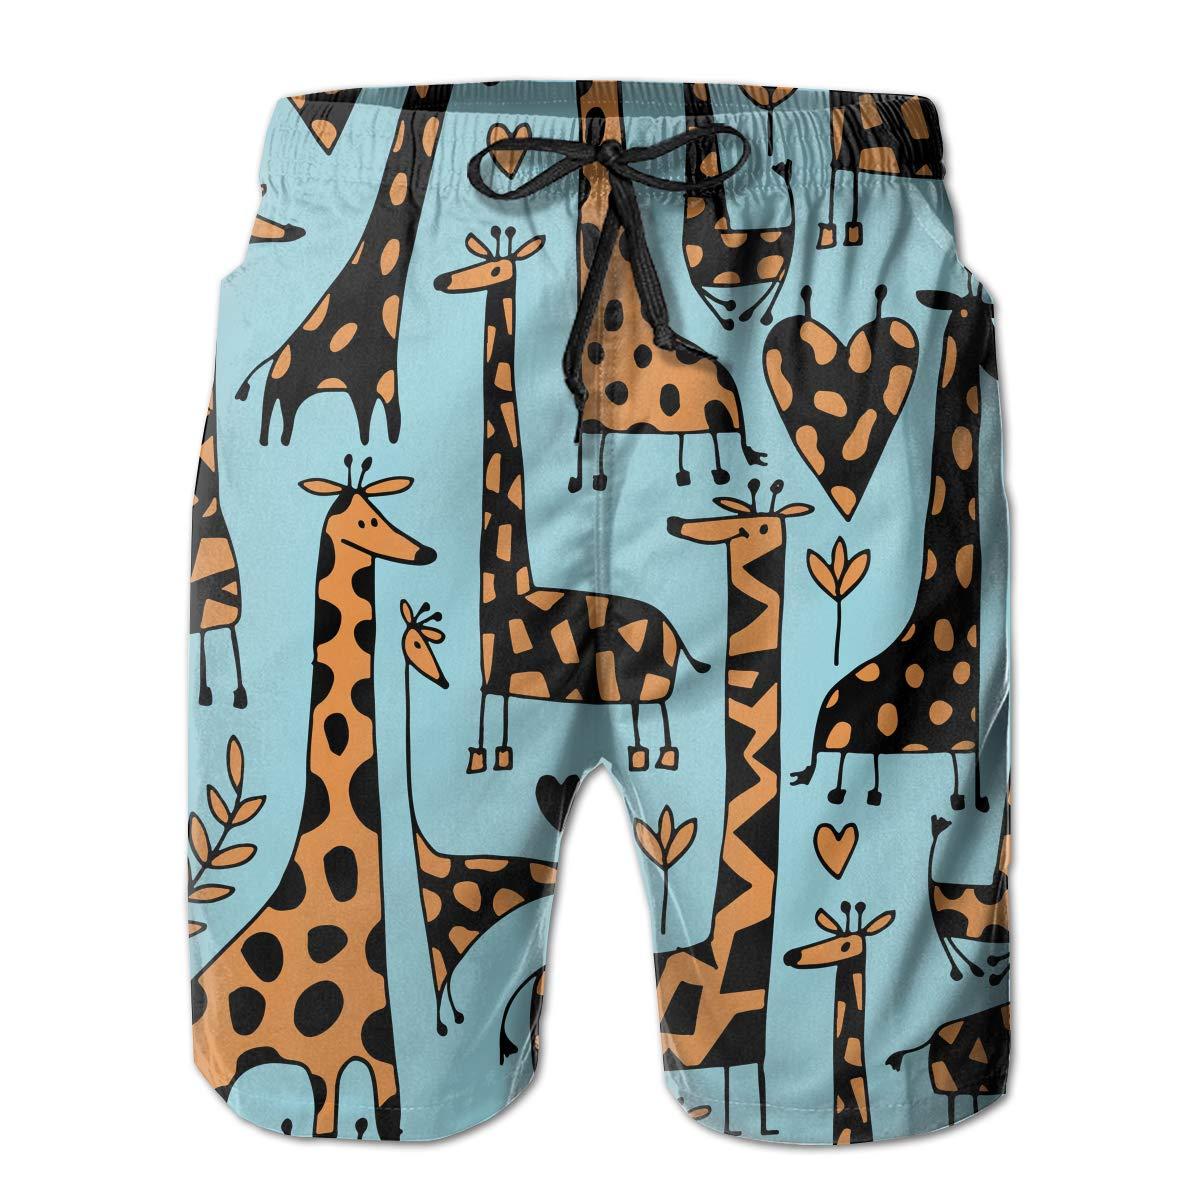 Boys Animals Giraffe Popular Quick Dry Swim Trunks Elastic Drawstring Cargo Shorts with Pocket